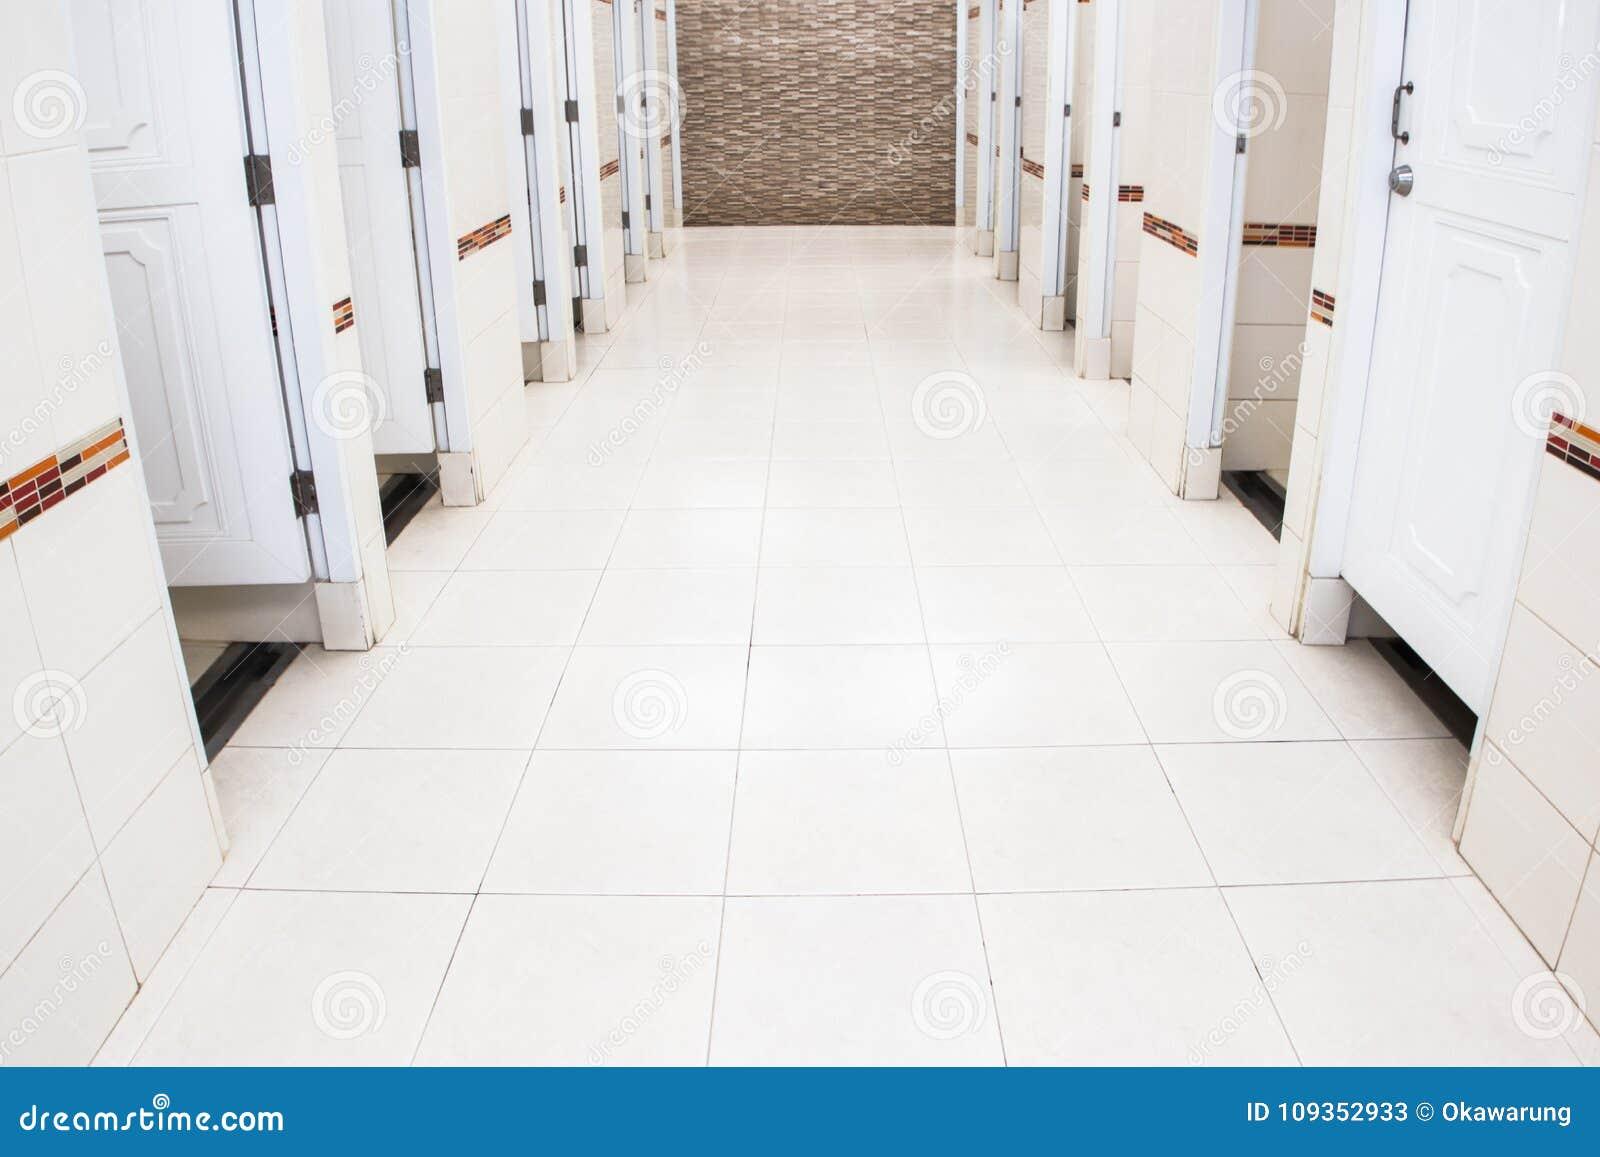 White Tiles Bathroom.Tiled Floor Marble White Ideal For A Background ...